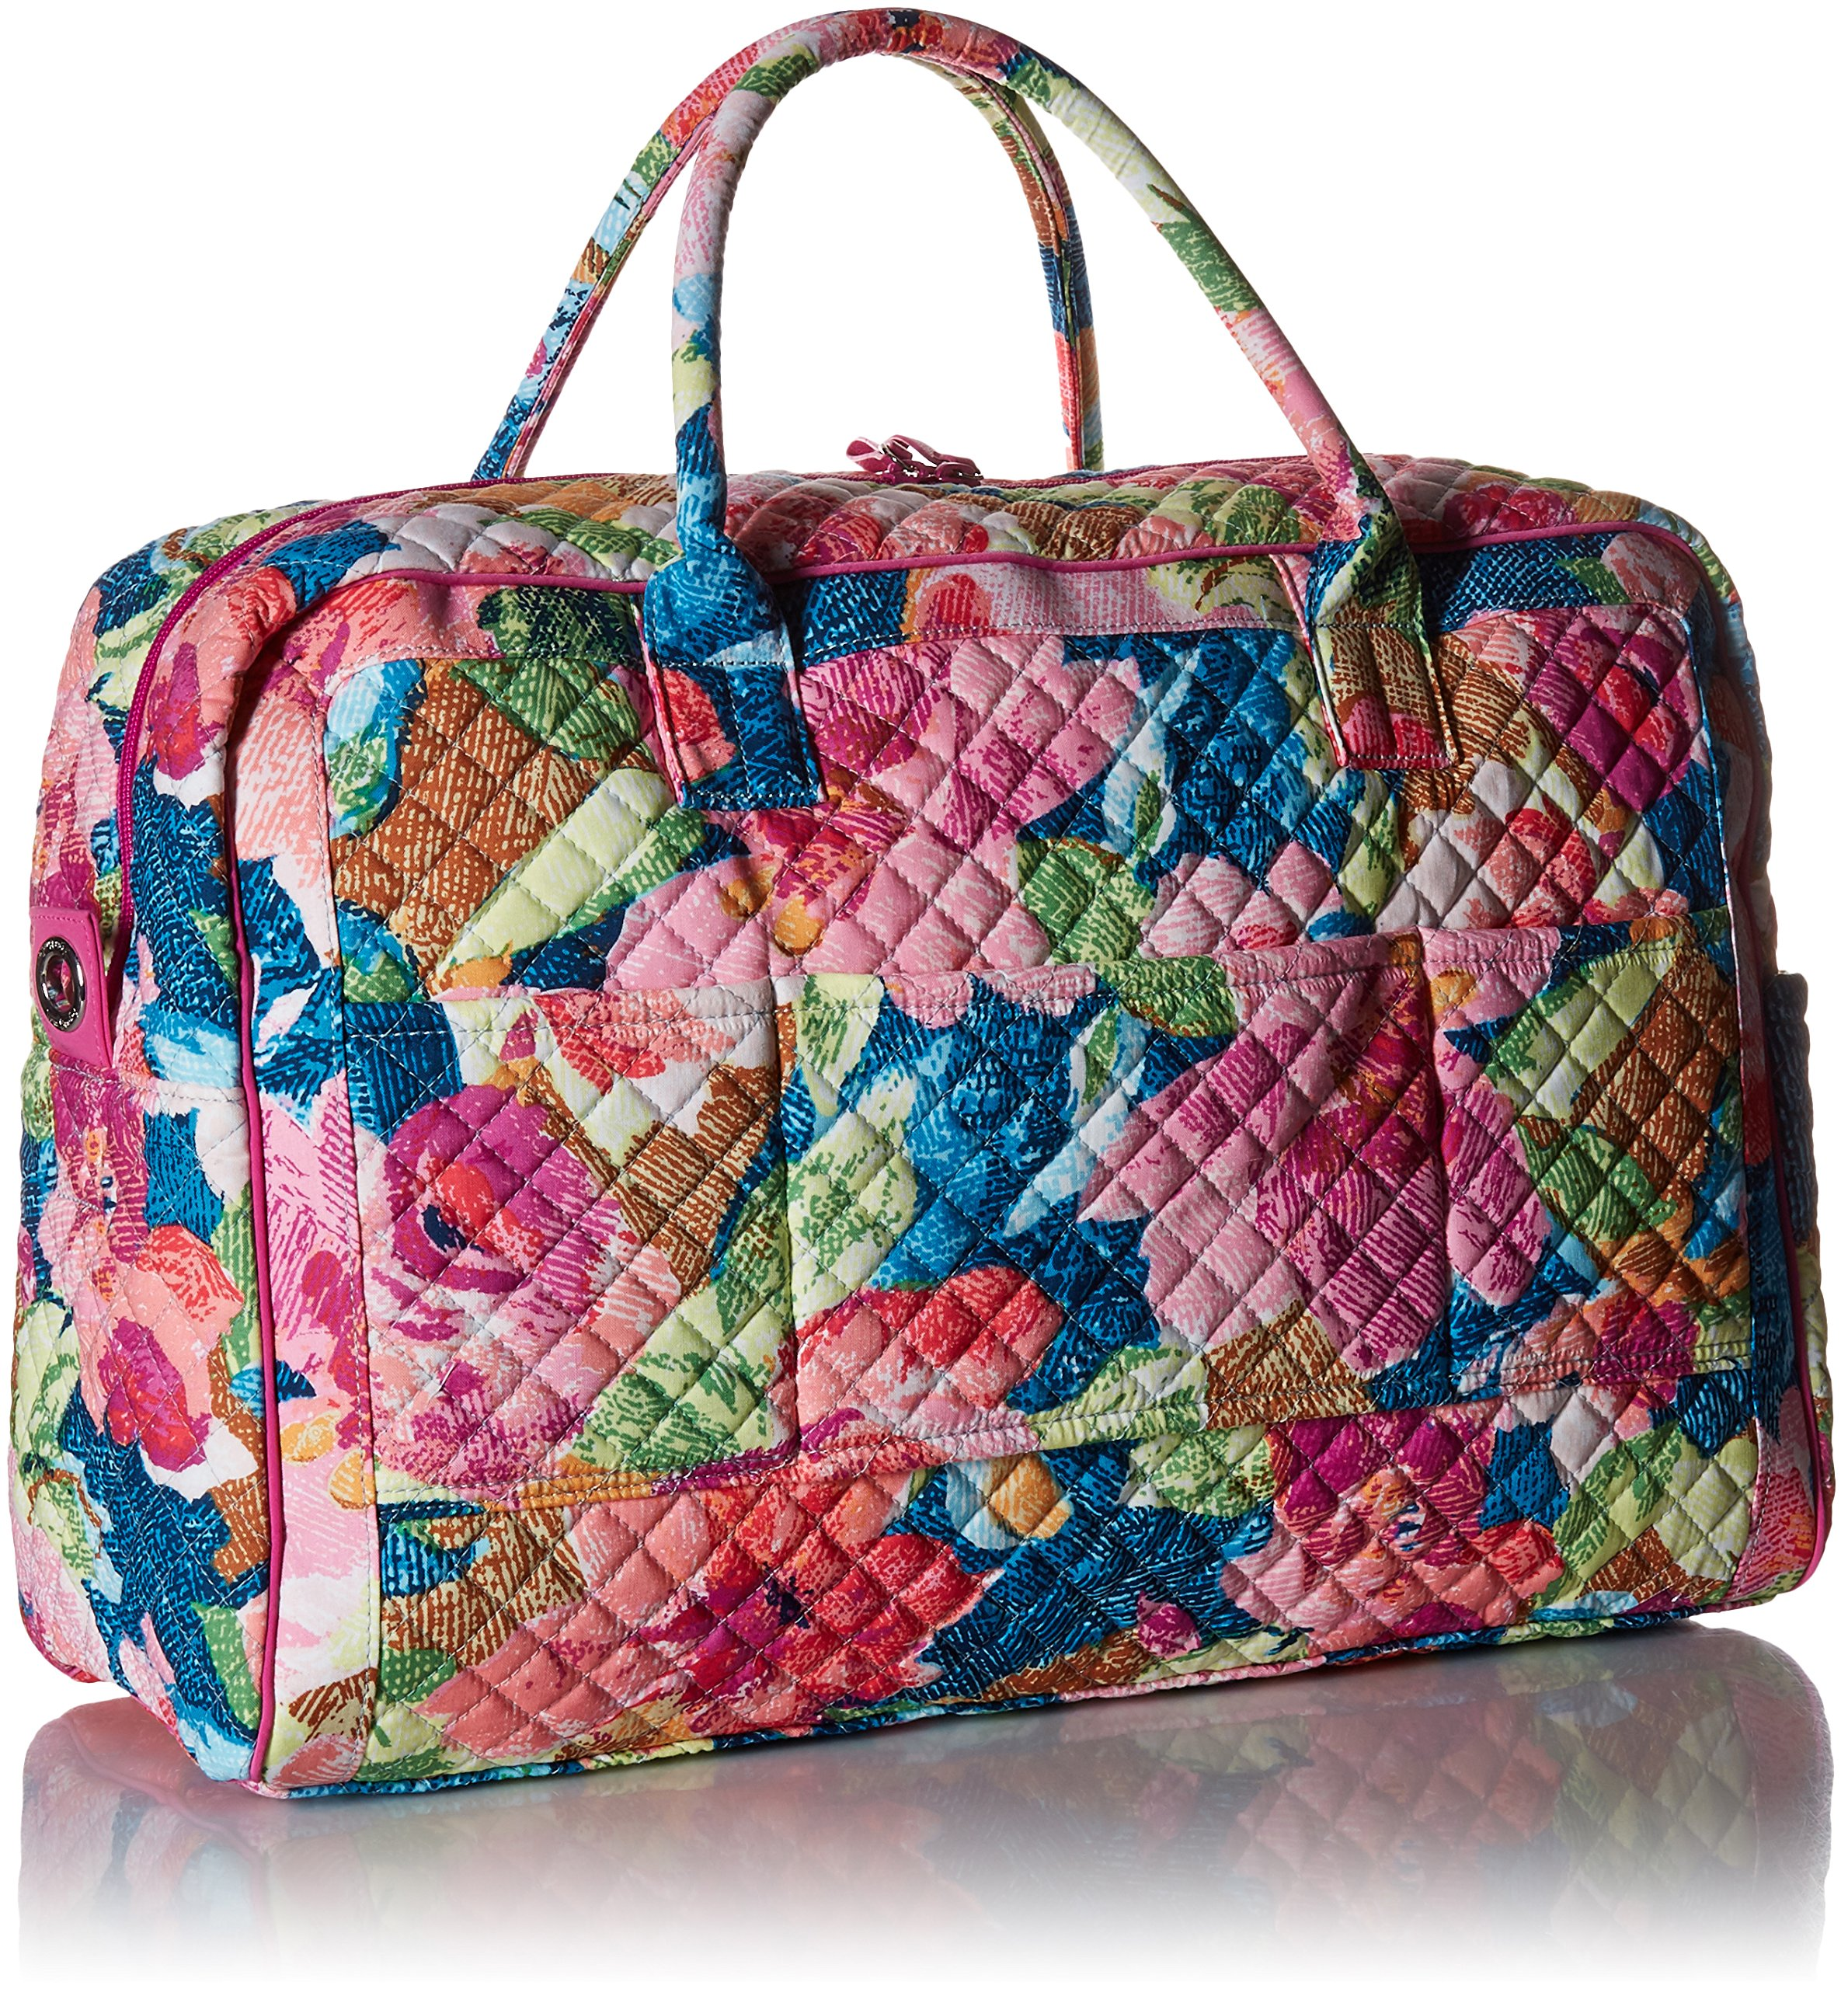 Vera Bradley Iconic Weekender Travel Bag, Signature Cotton, Superbloom by Vera Bradley (Image #3)